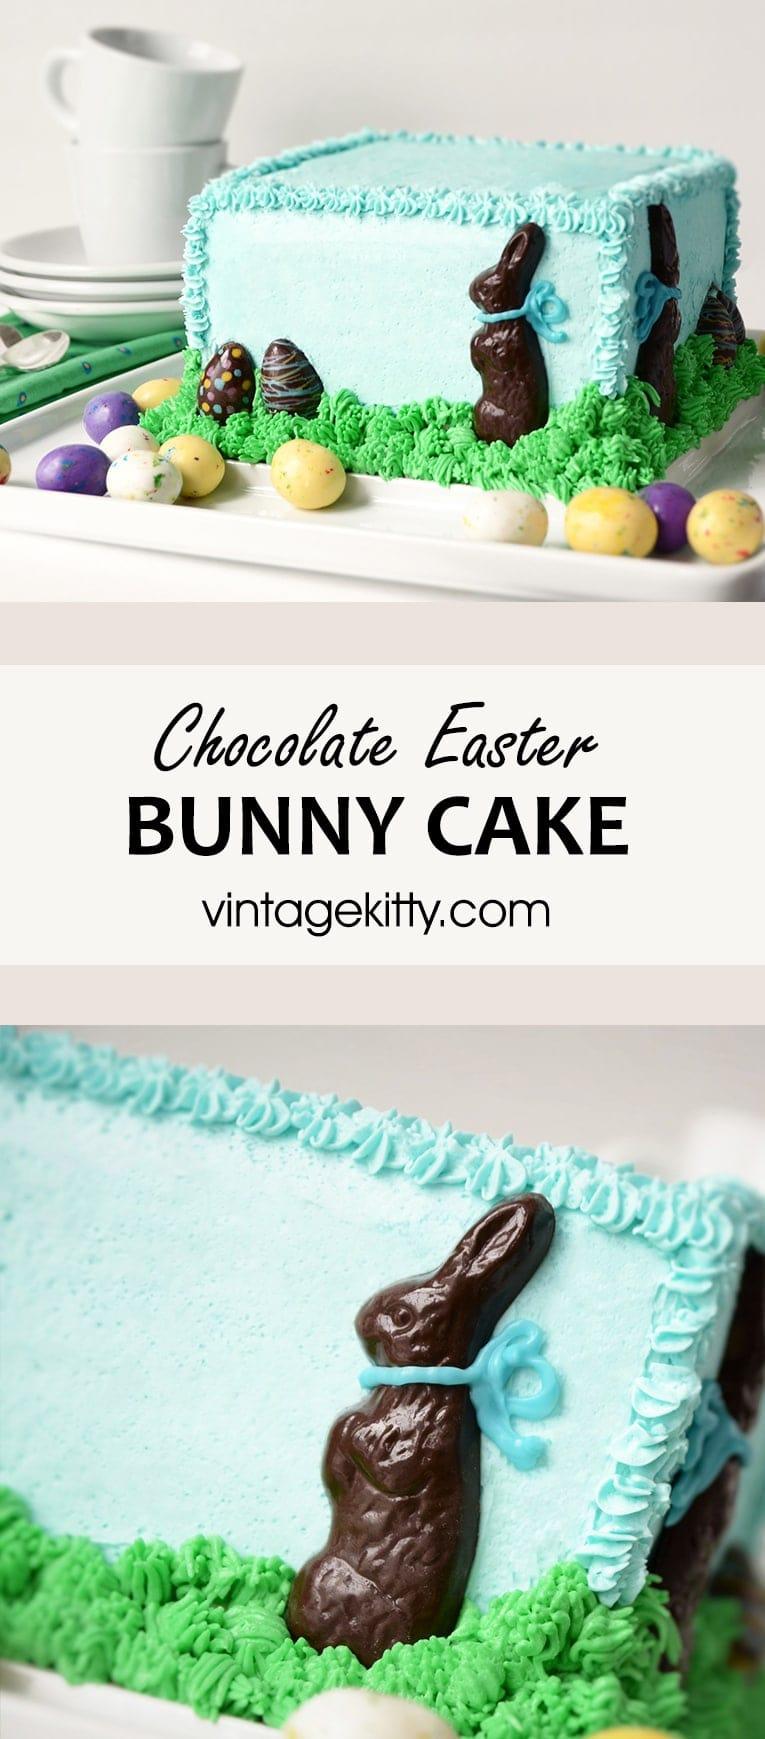 Chocolate Easter Bunny Cake Pin 2 - Chocolate Easter Bunny Cake